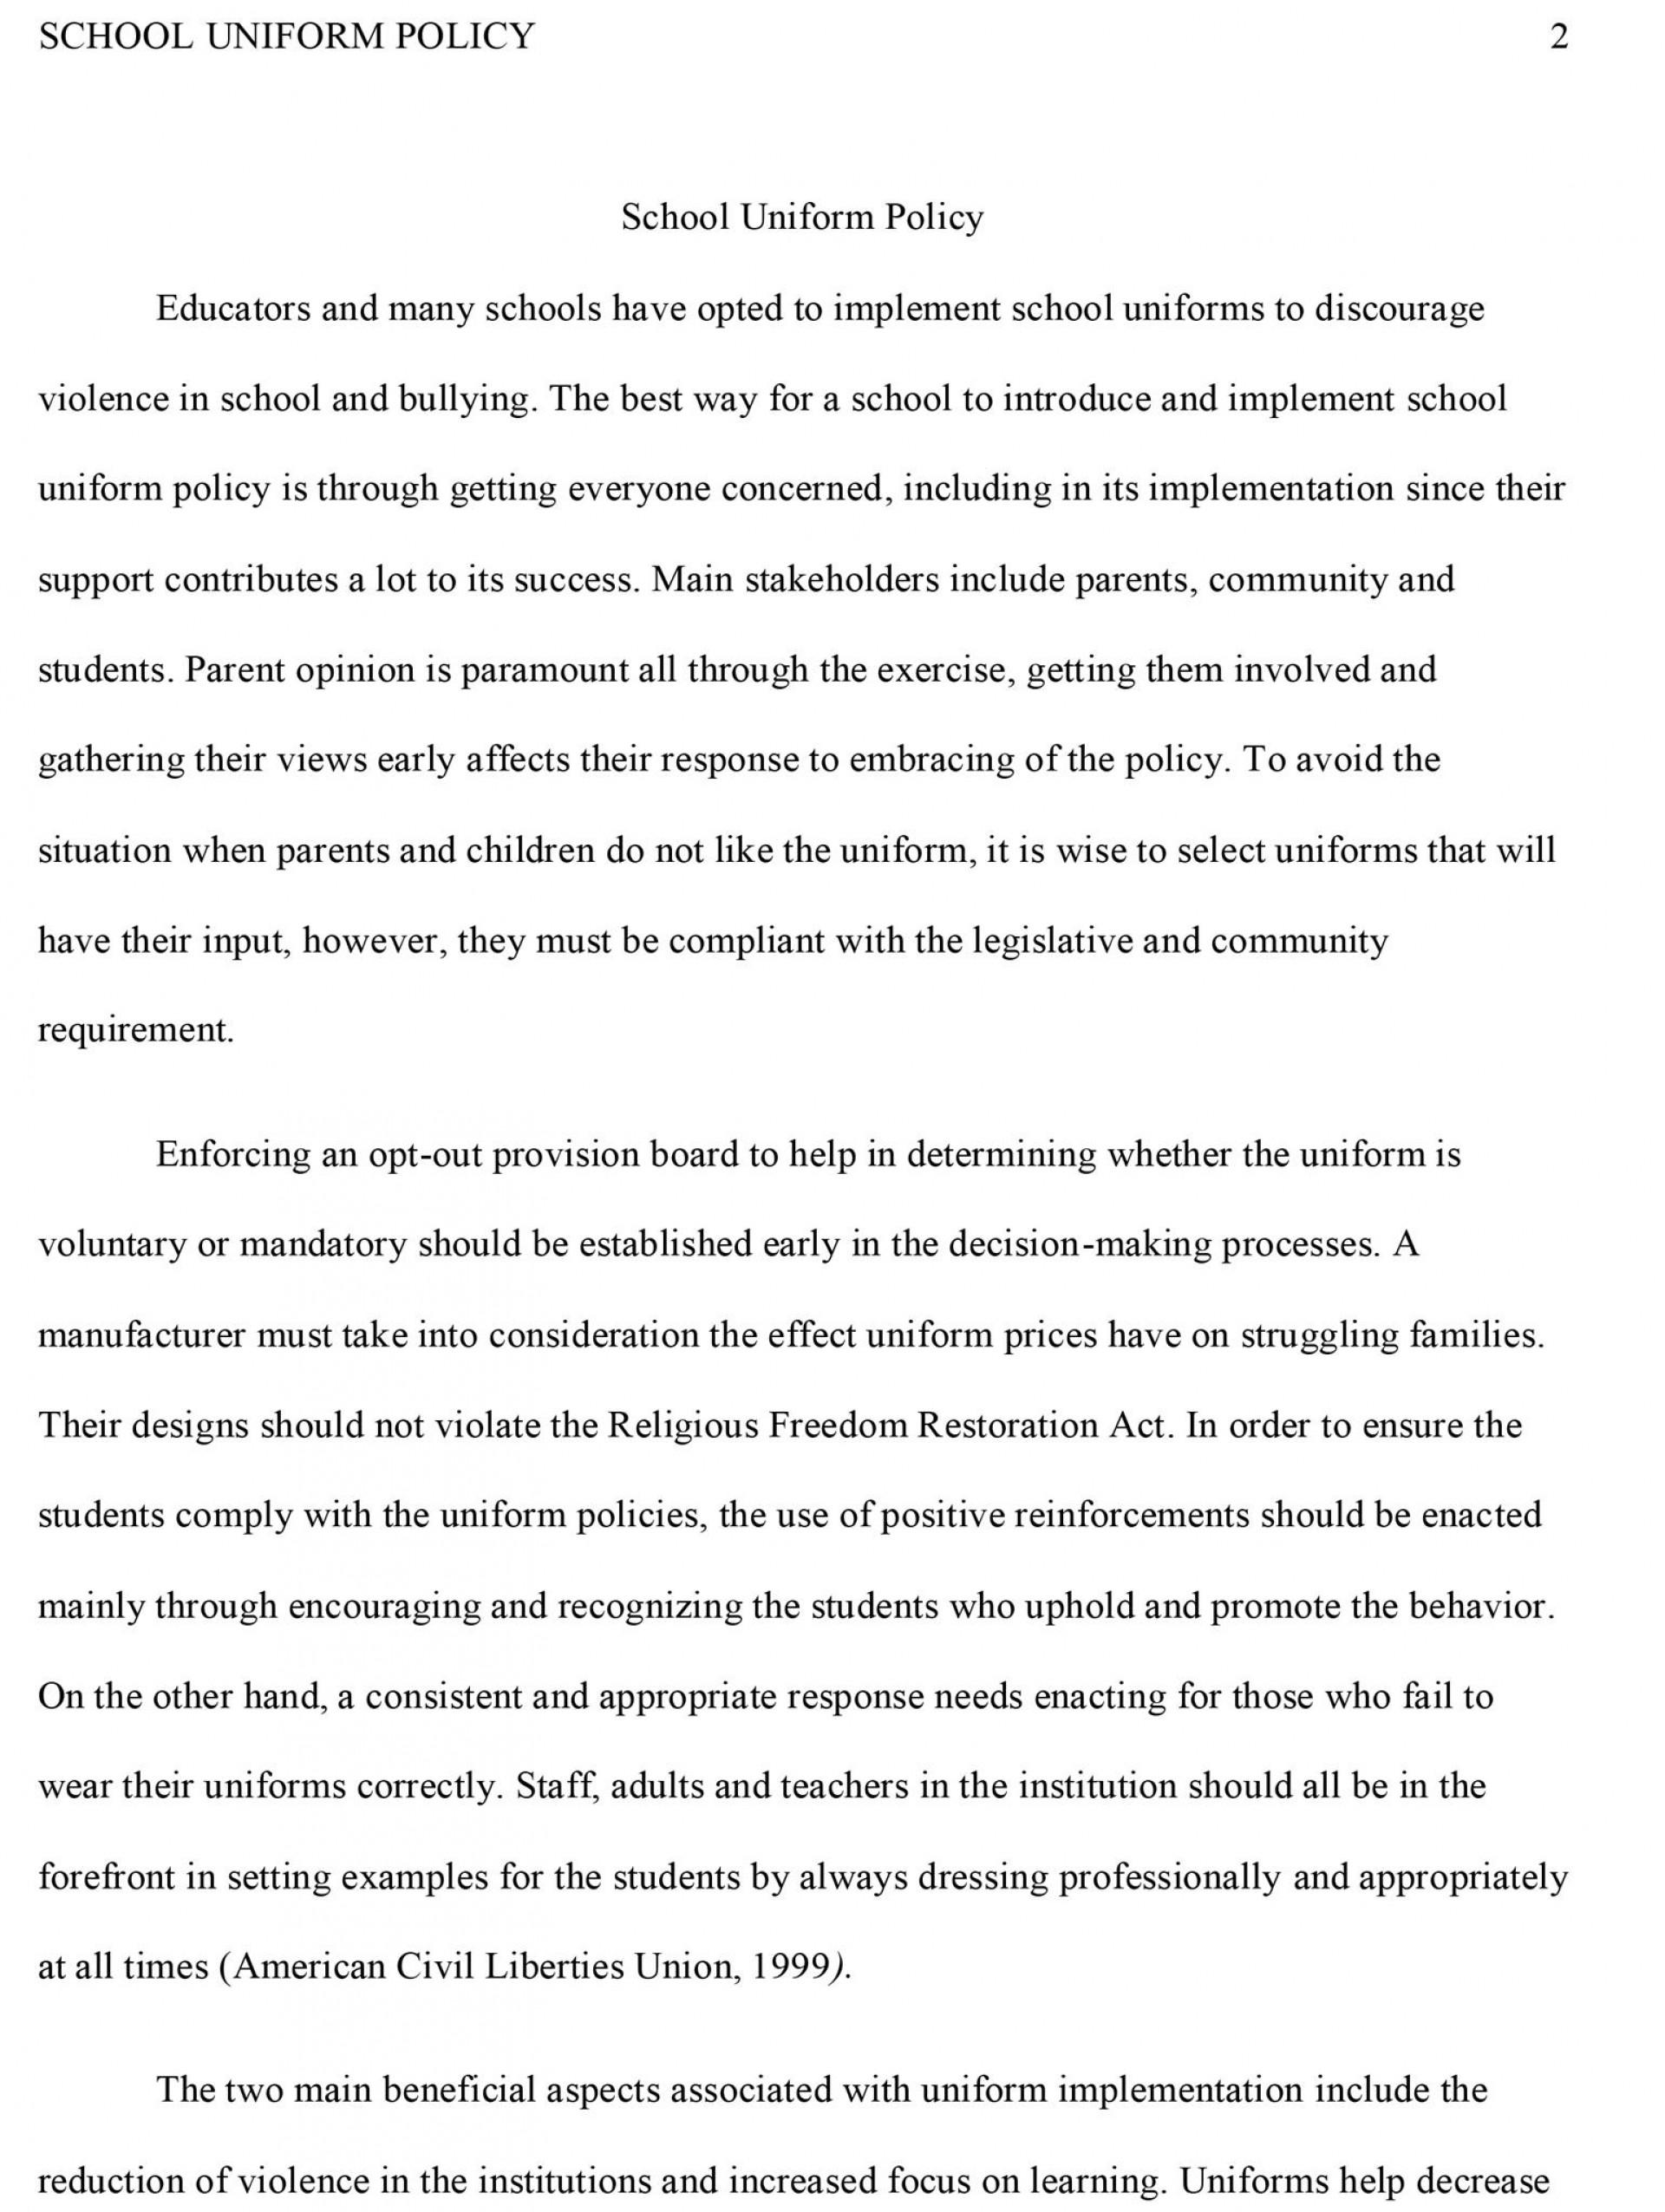 002 Essay Example School Sample Impressive Uniforms Against Conclusion Outline 1920